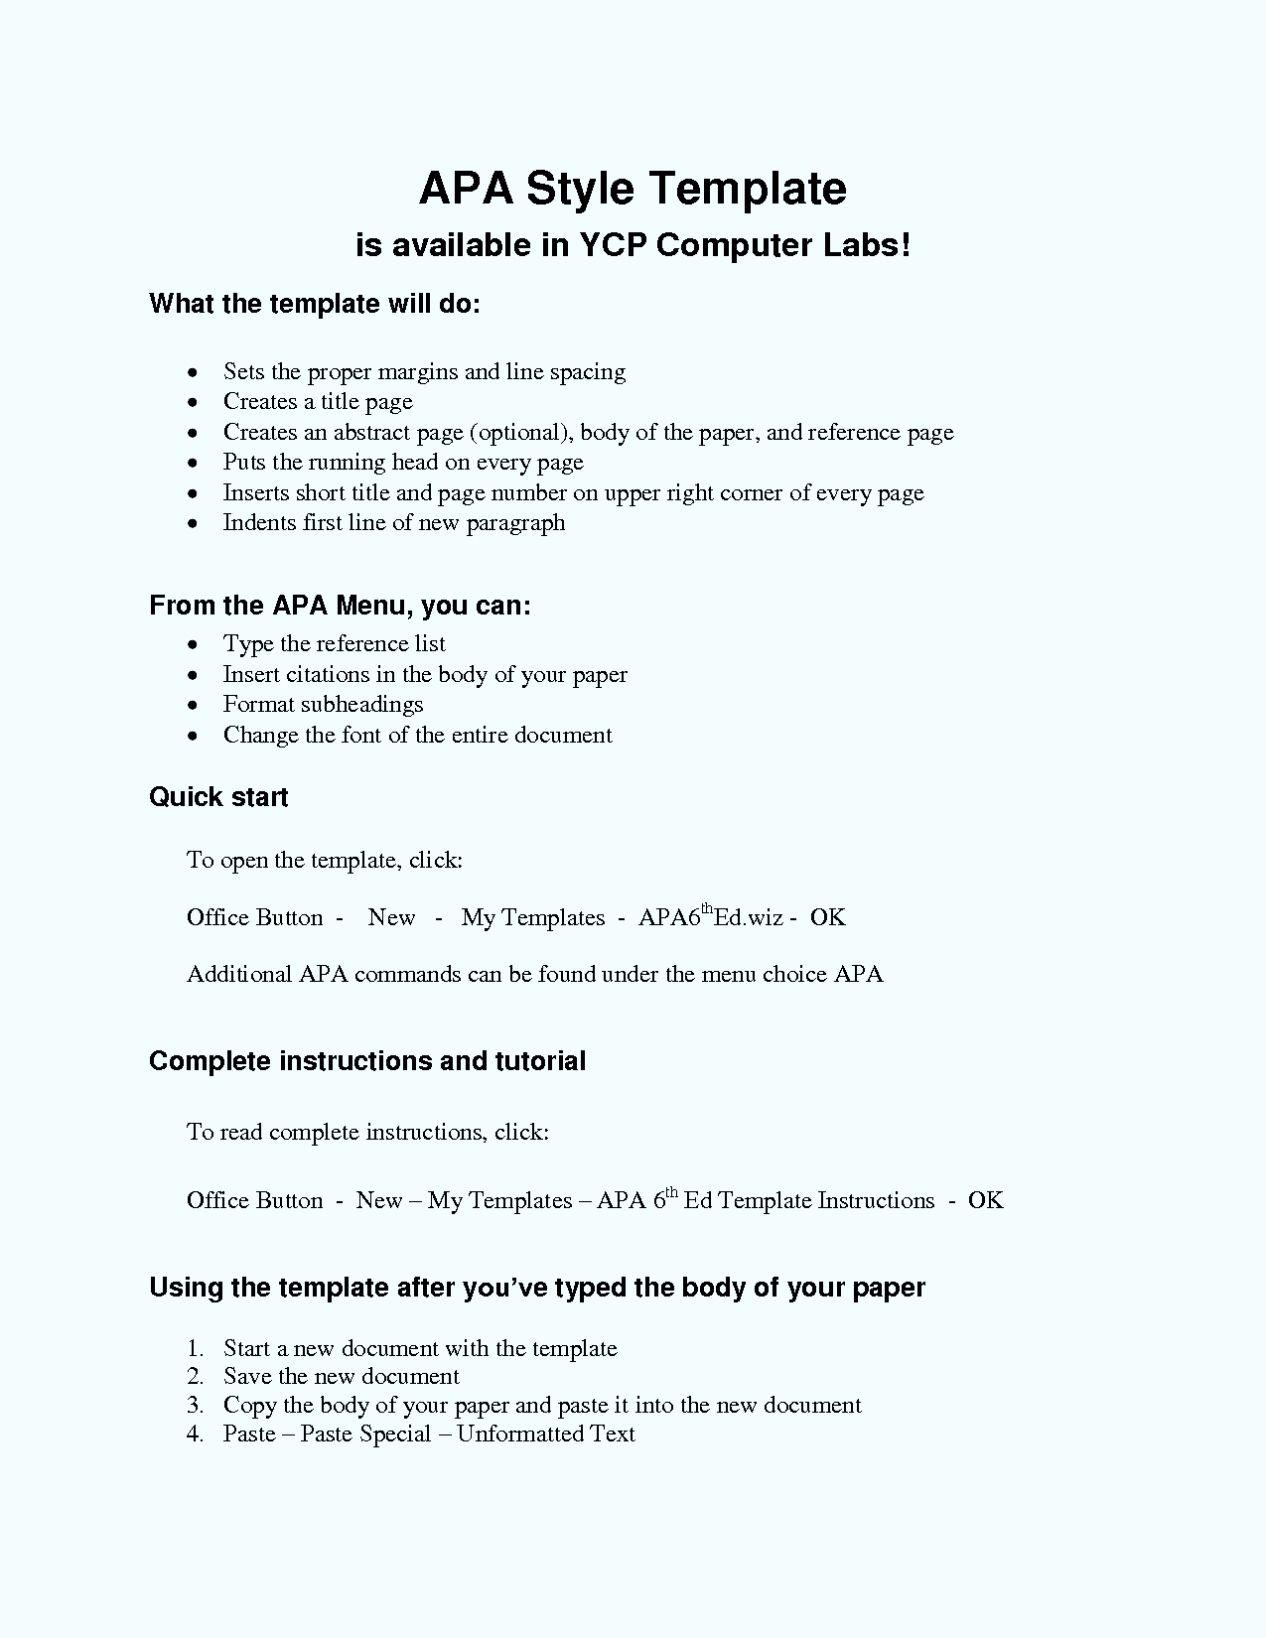 Apa Format Paper Template Graceful Apa Research Paper Template Of 38 Luxury Apa Forma Apa Research Paper Research Paper Outline Template Research Paper Outline